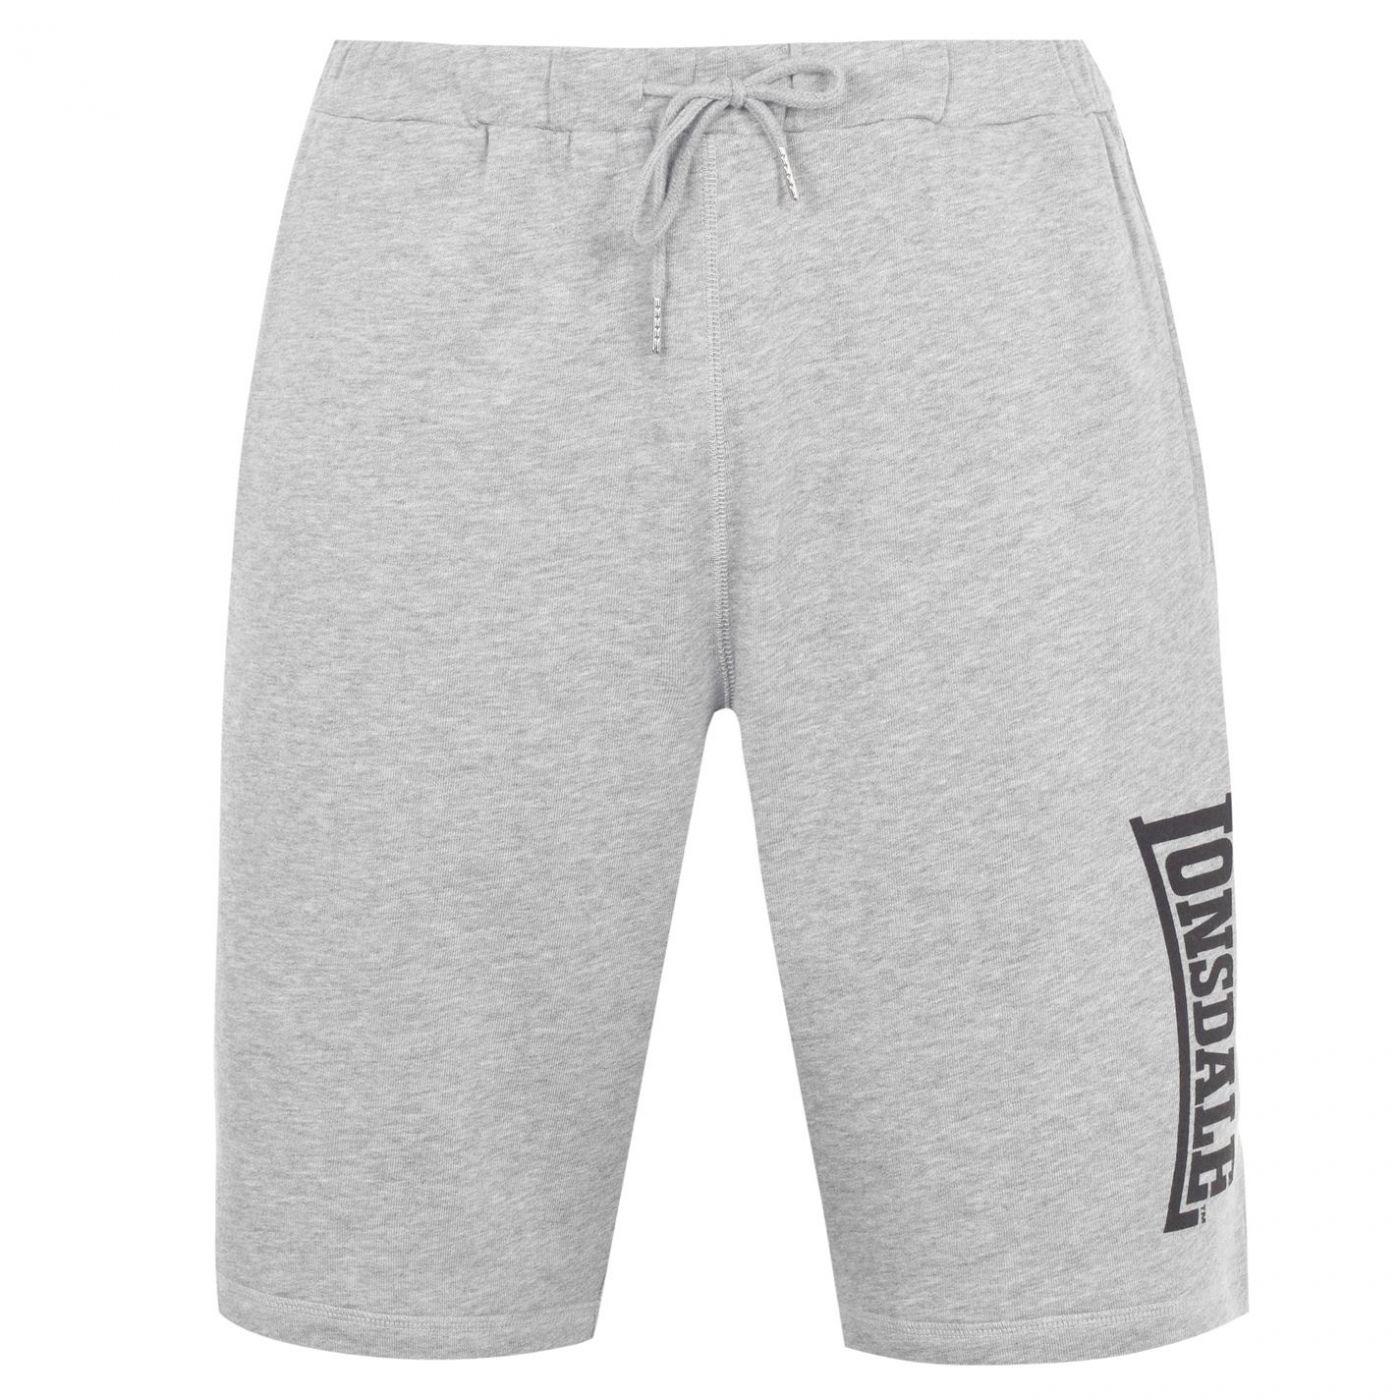 Lonsdale Japan Fleece Shorts Mens